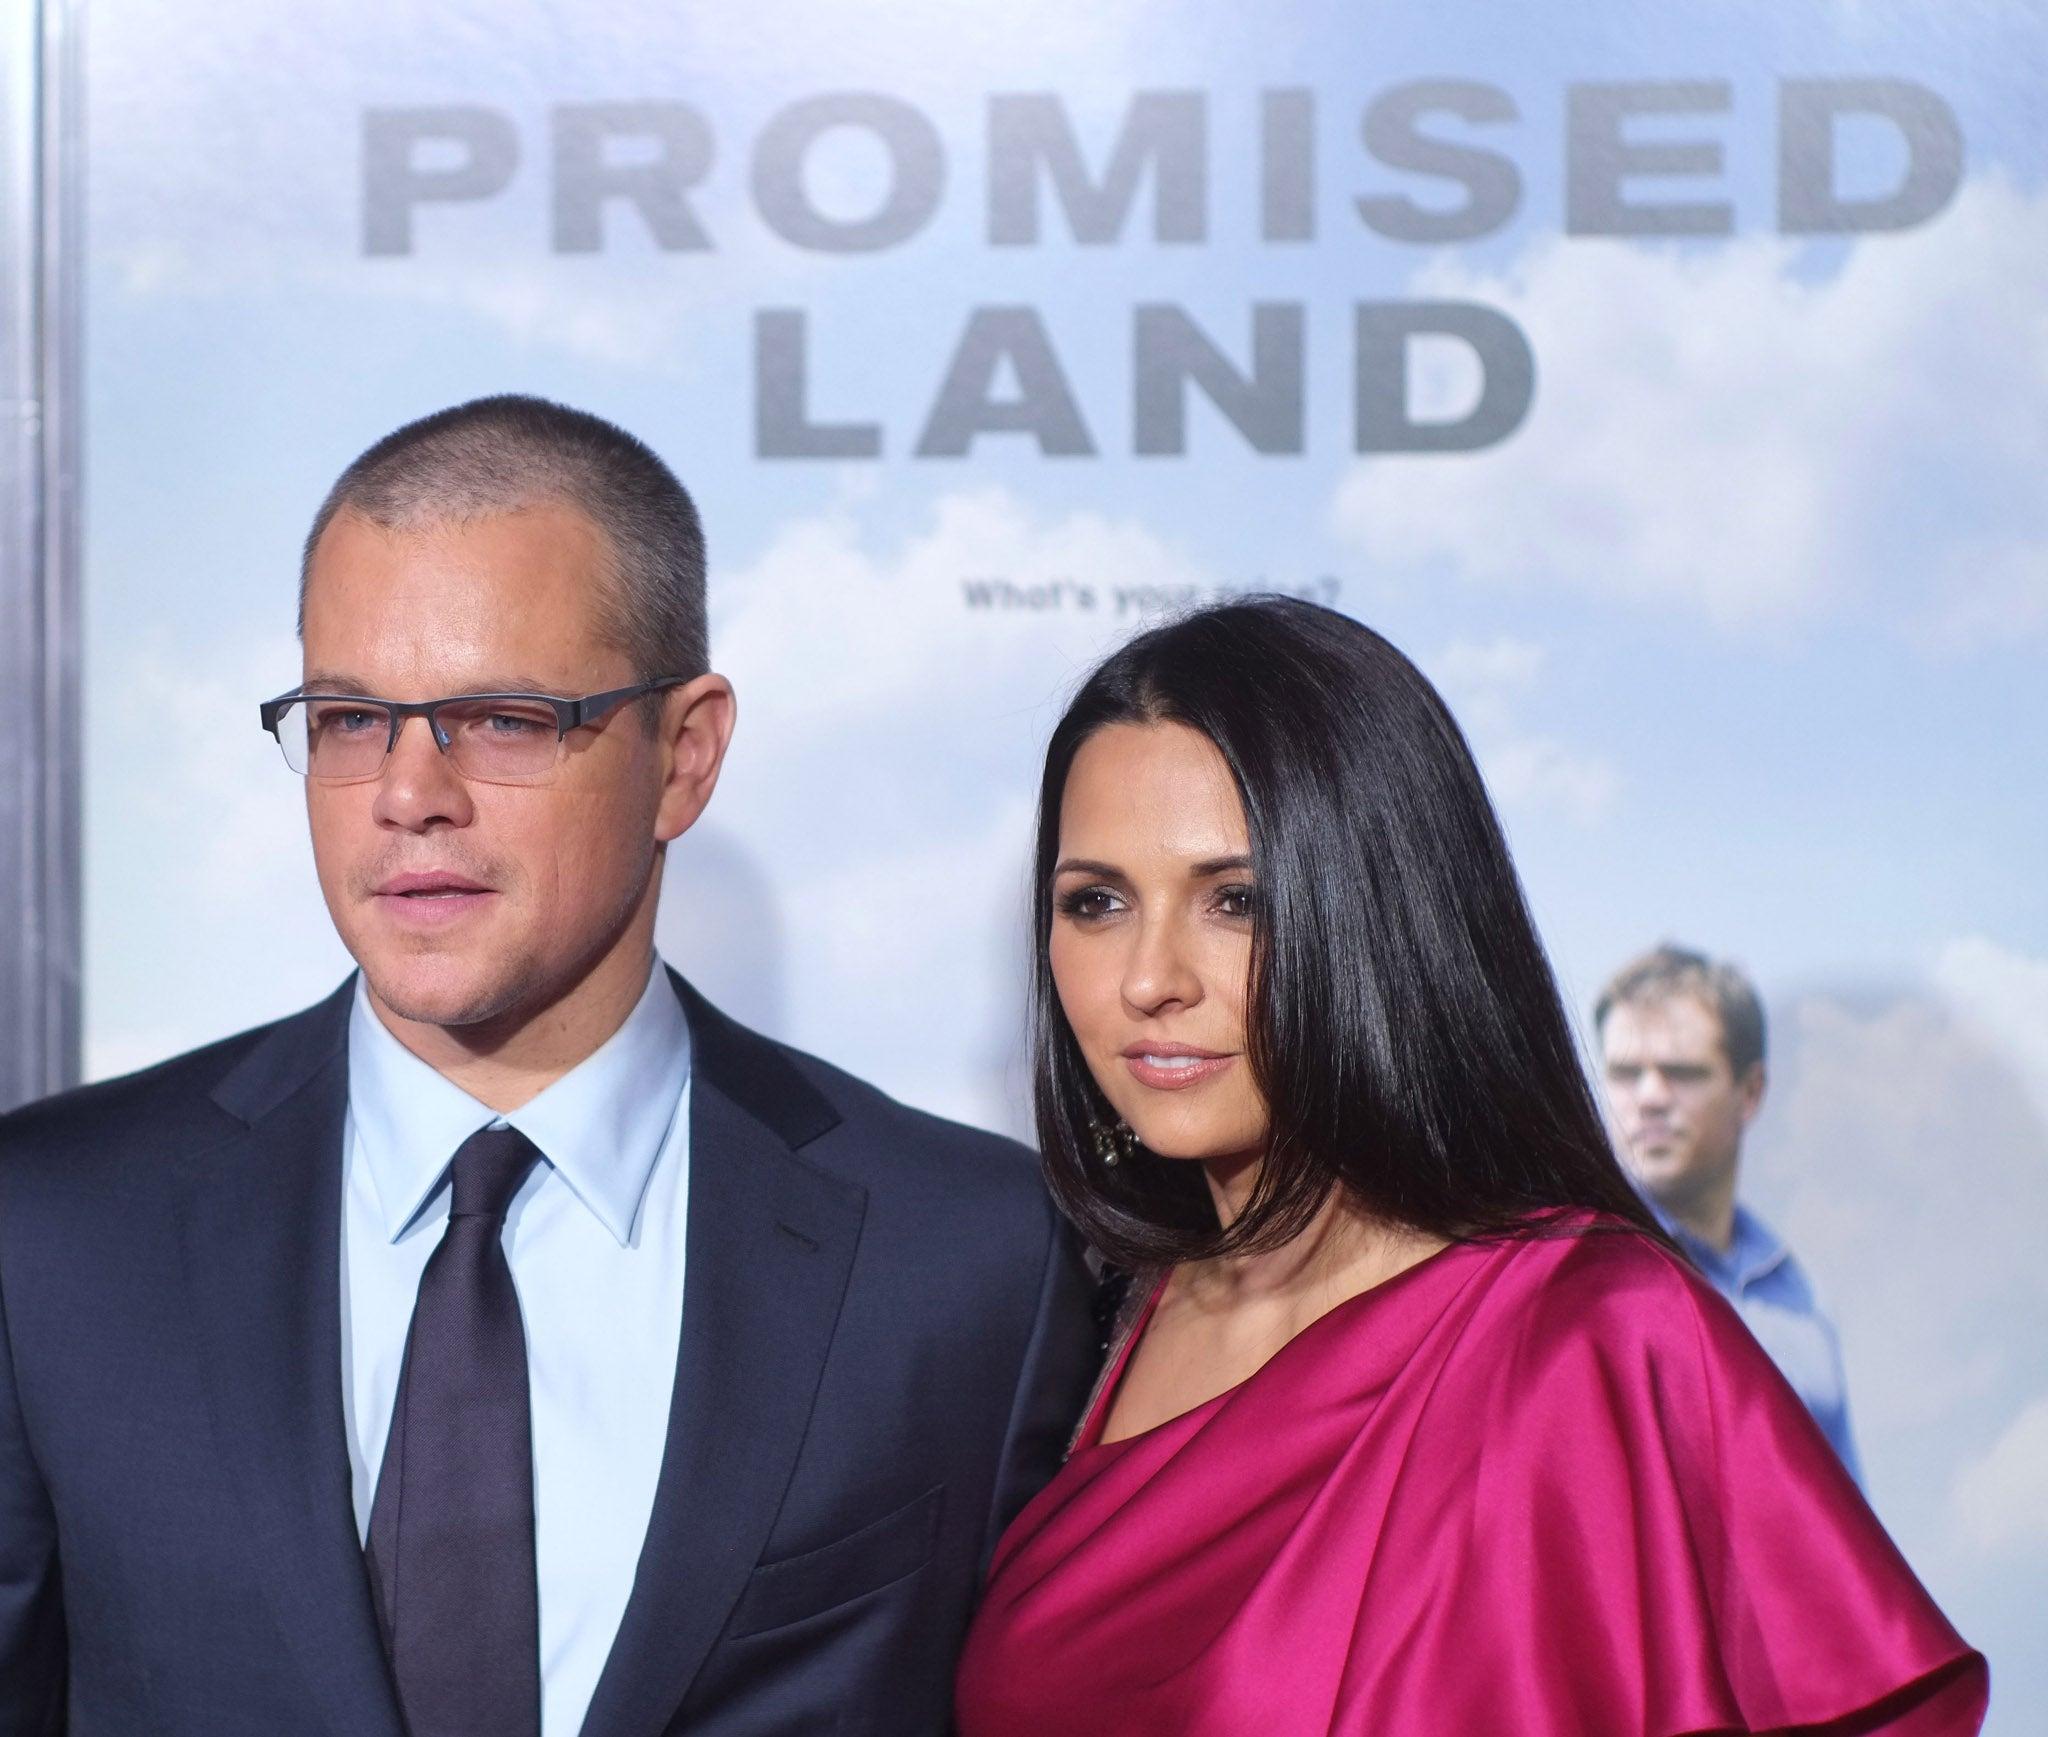 Samsclub Credit Login >> Promised Land: Matt Damon's movie about fracking will compete in Berlin film festival | The ...